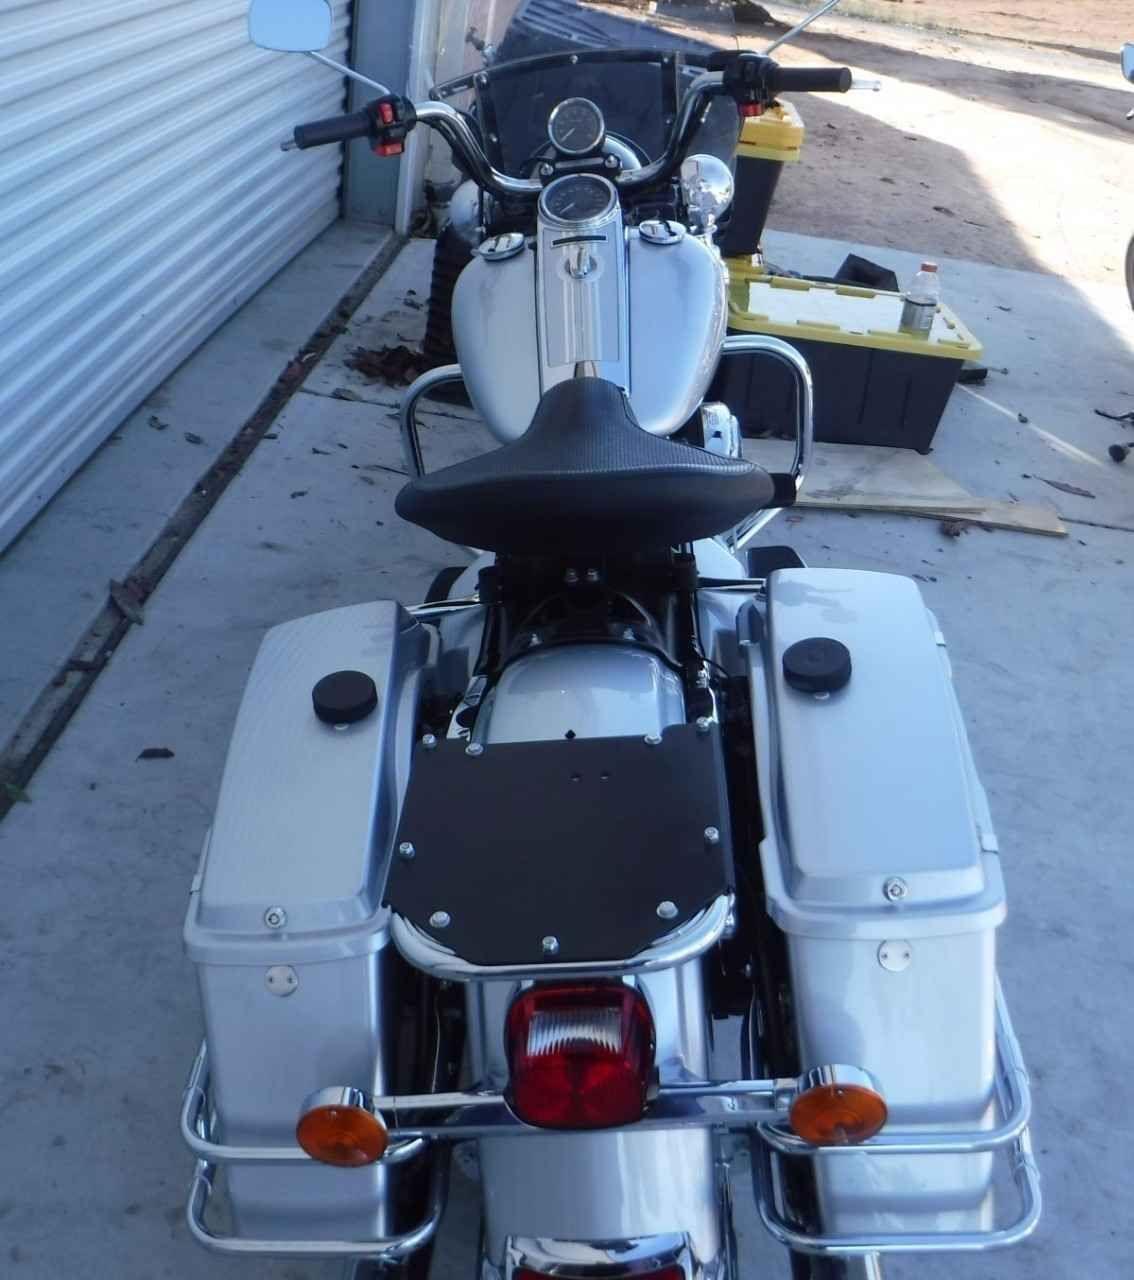 Used 2013 HarleyDavidson ROAD KING Motorcycles For Sale